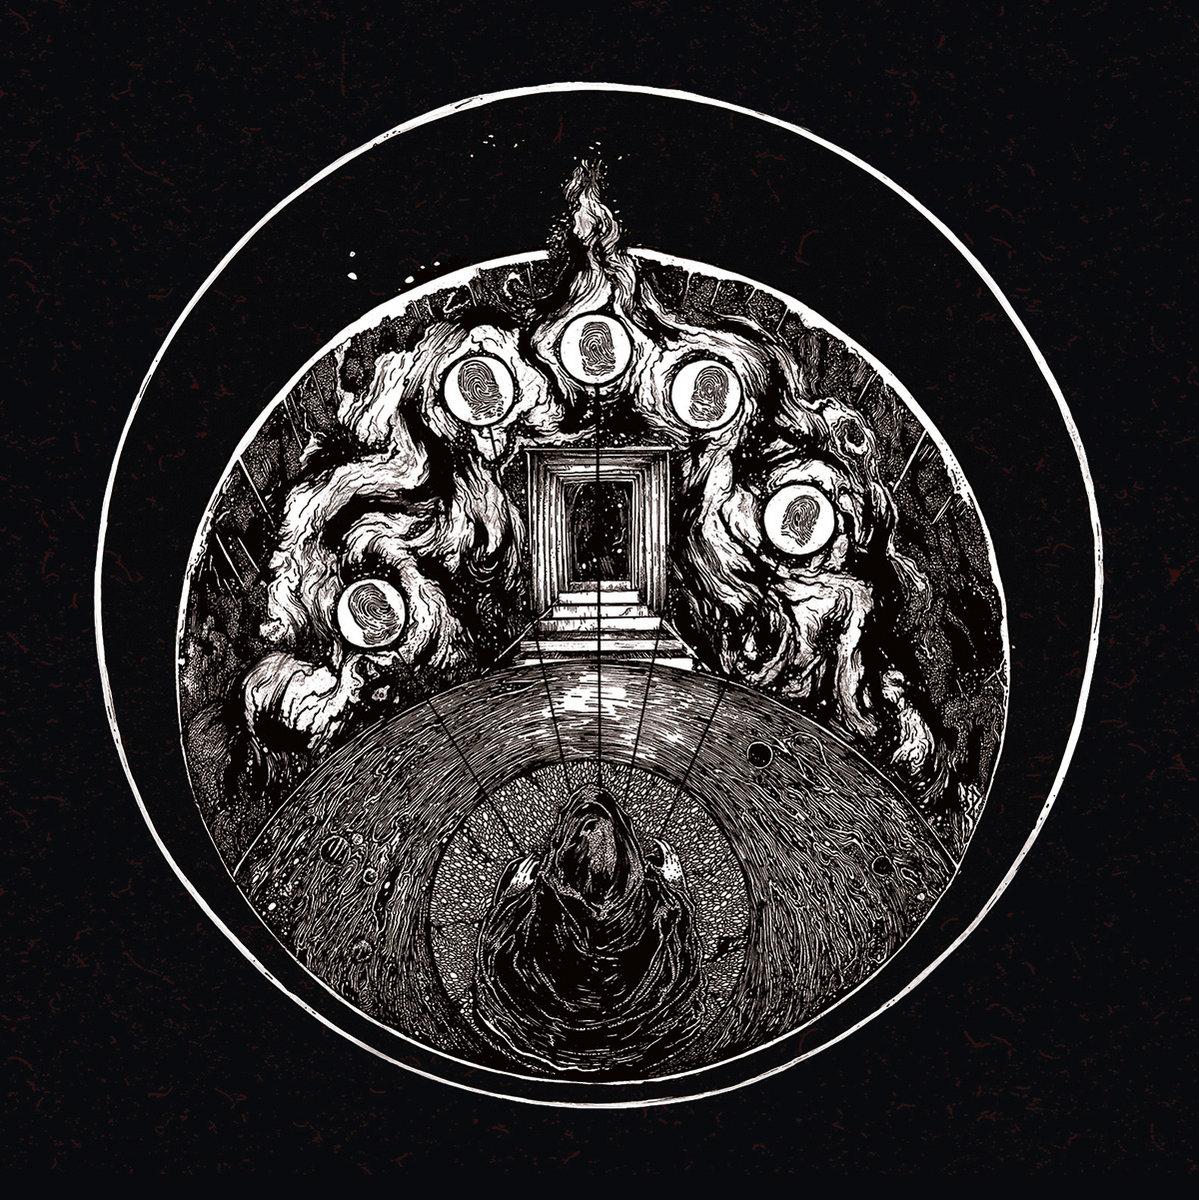 Paramnesia - Paramnesia (2014)